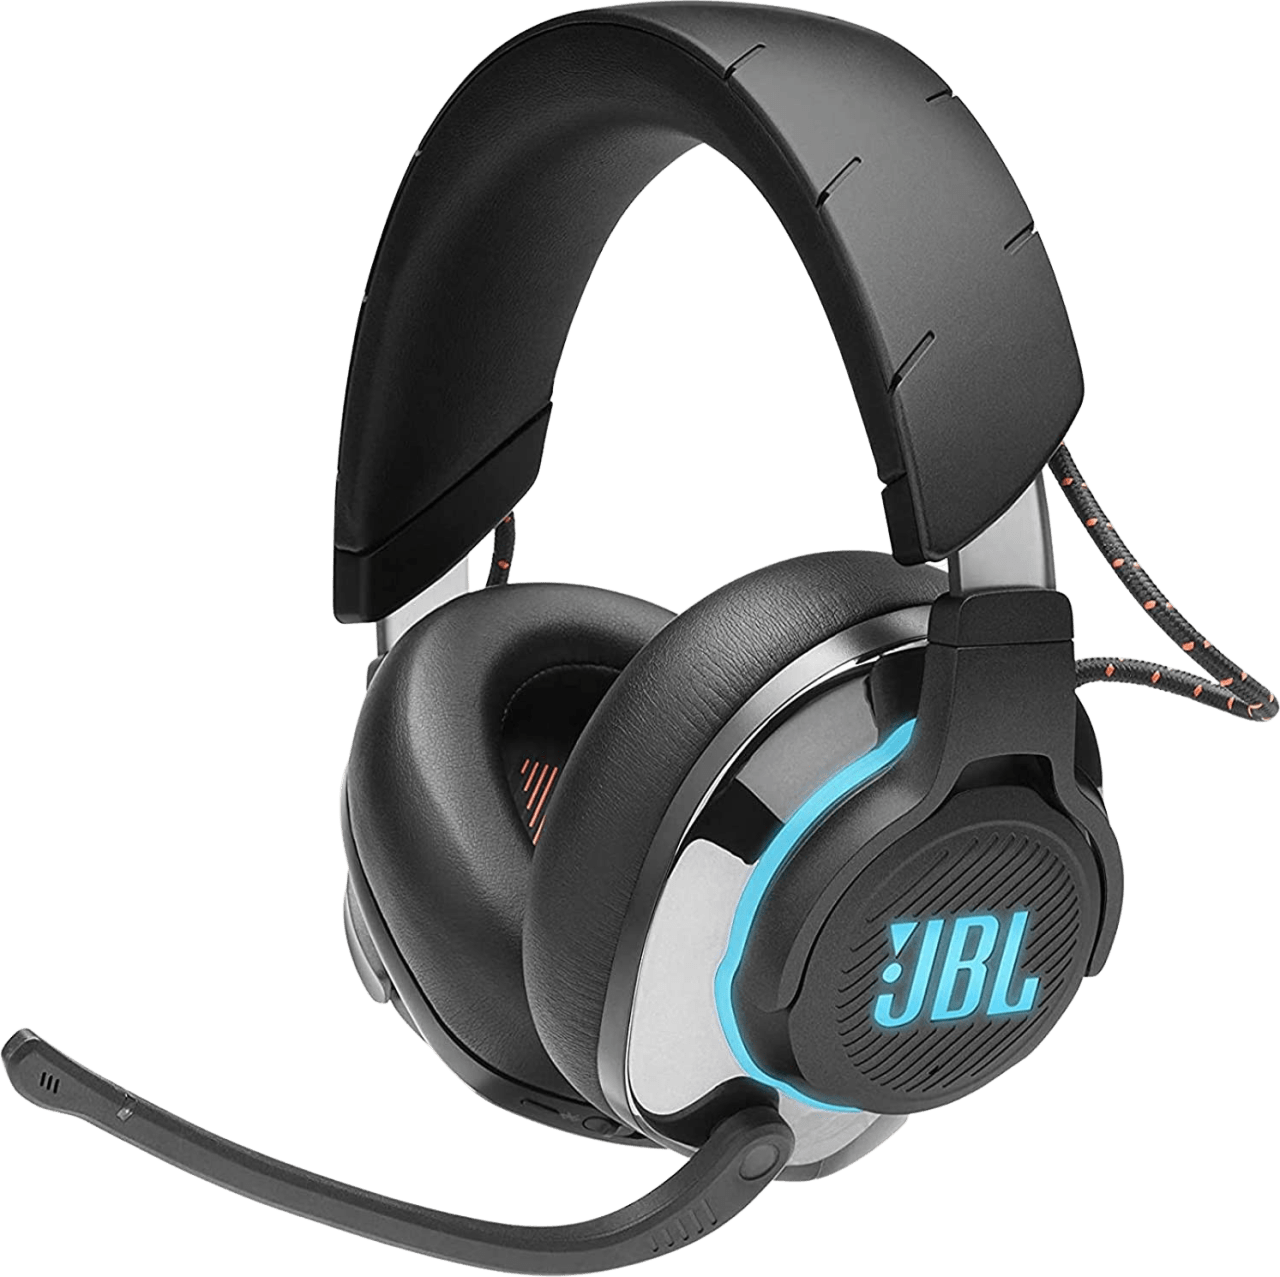 Schwarz JBL Quantum 800 Over-Ear-Gaming-Kopfhörer.1